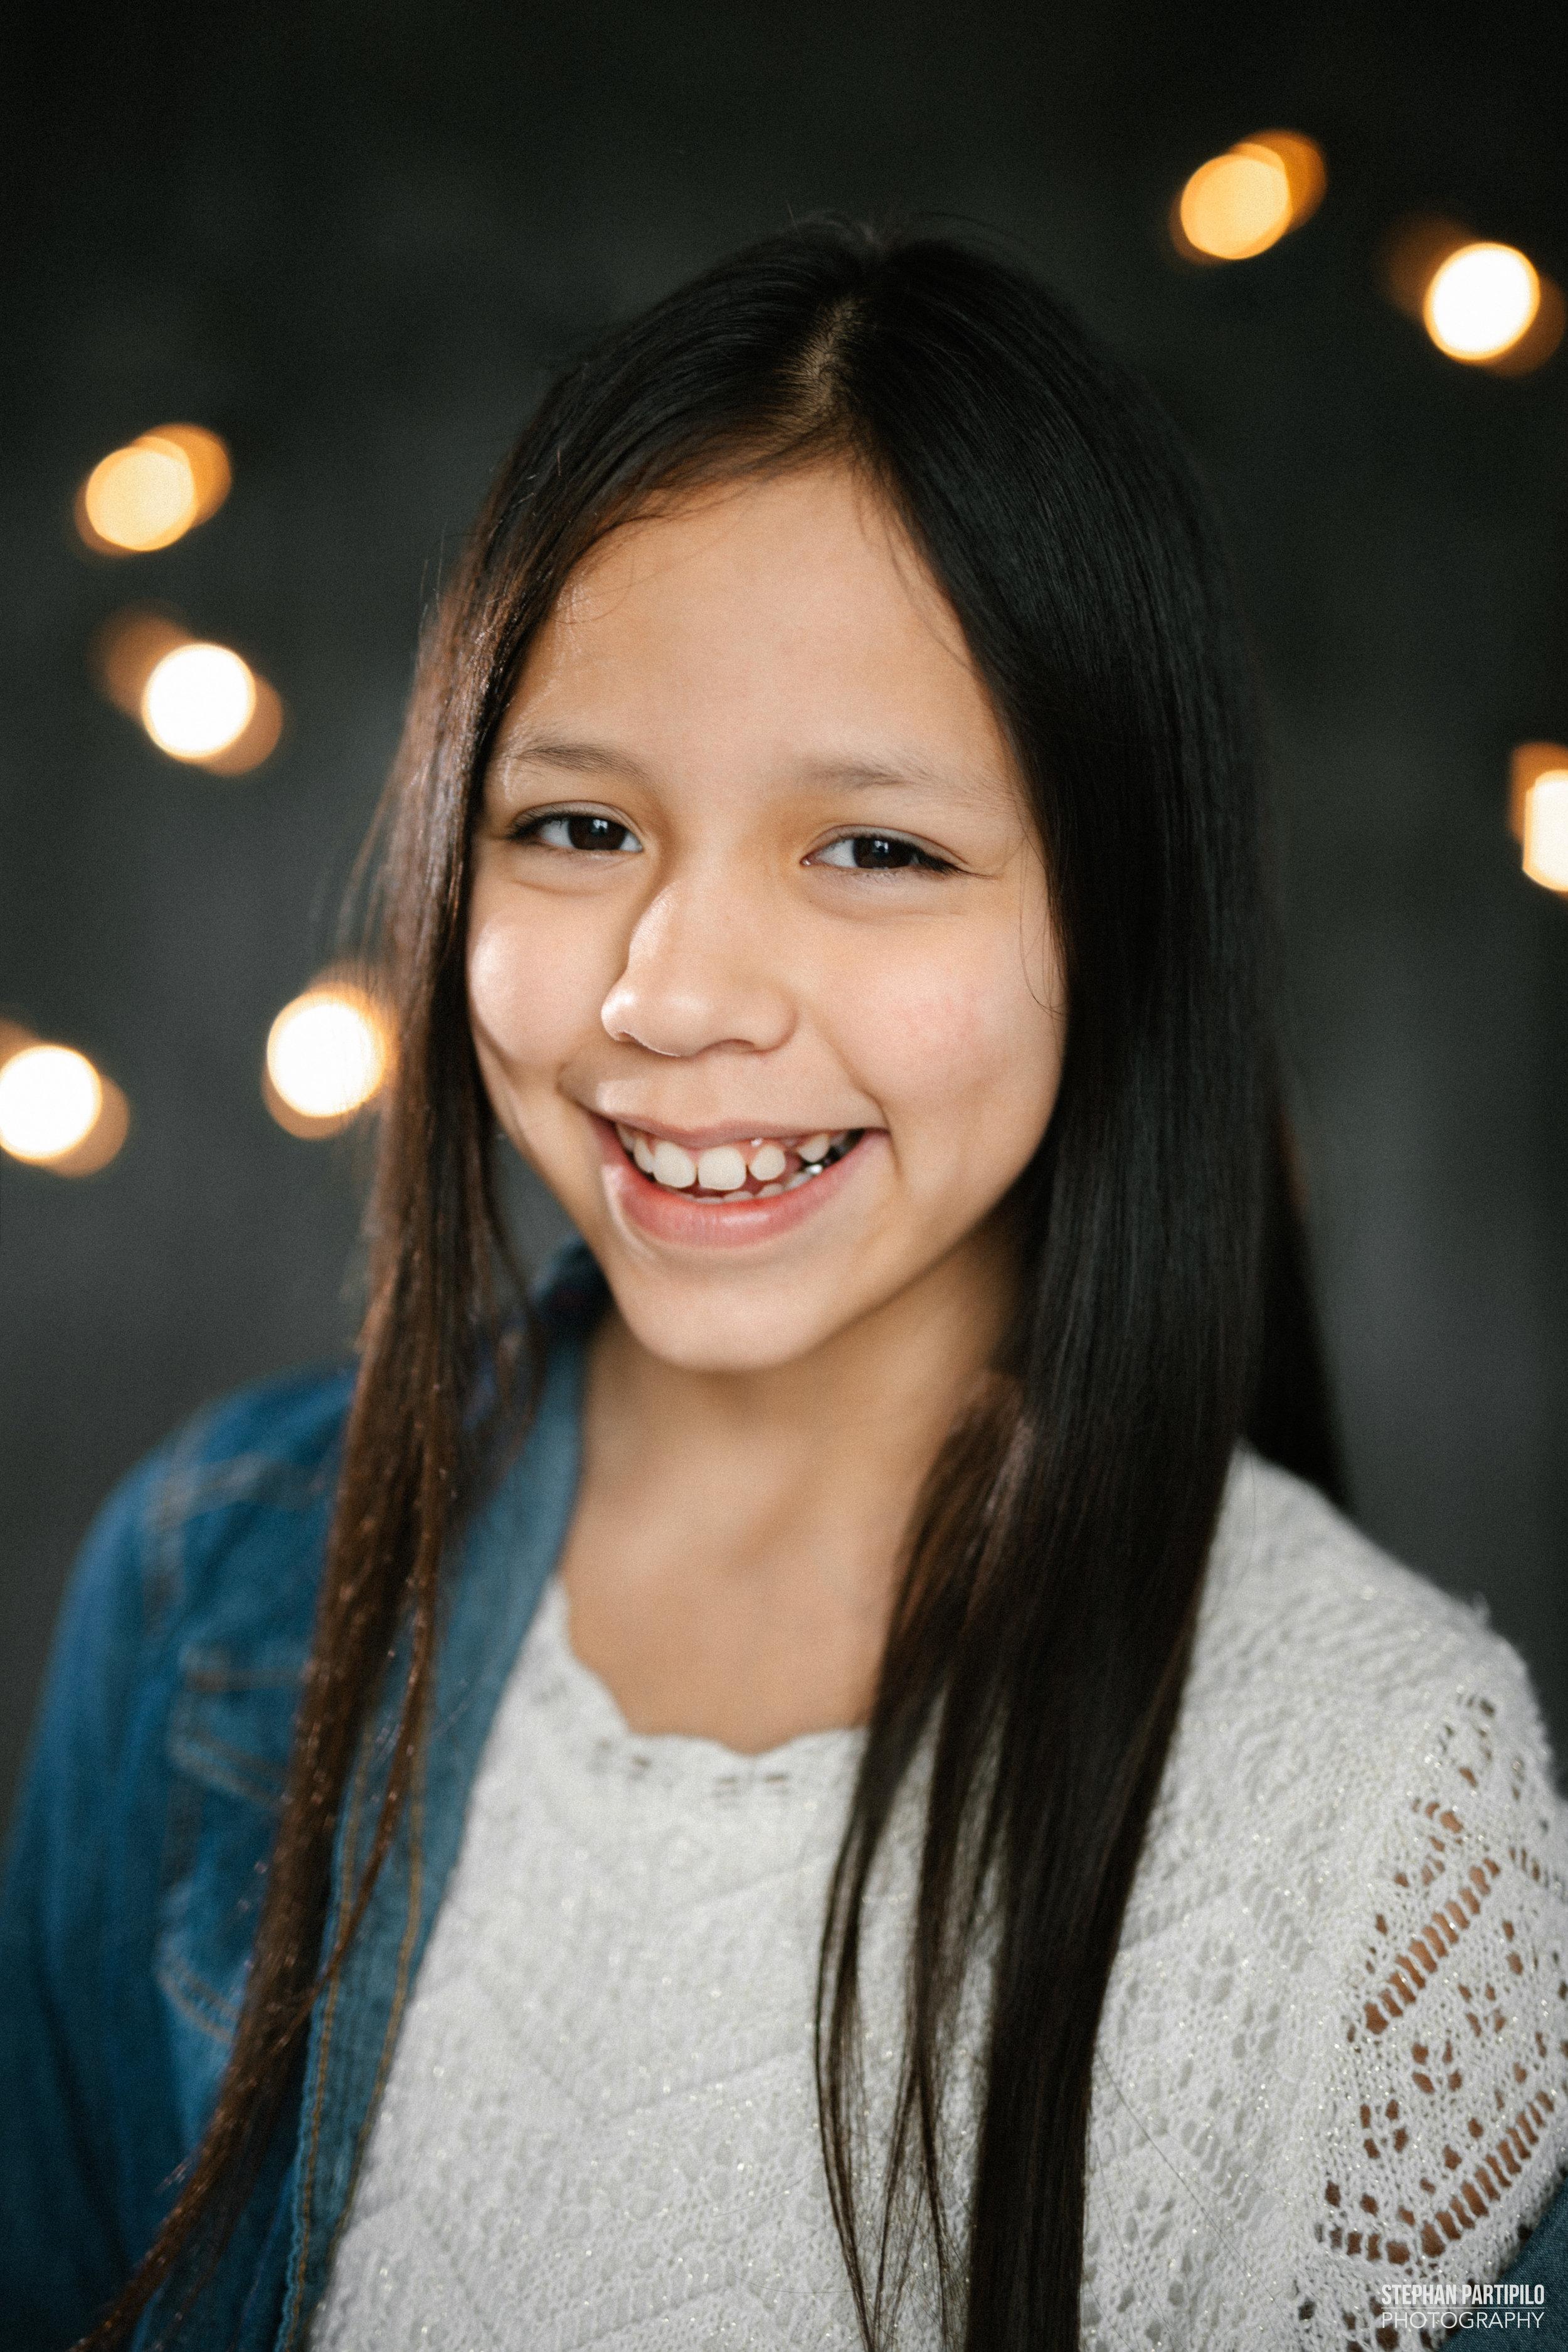 Marisol Child Model PDX 2019 0G5A9269.jpg